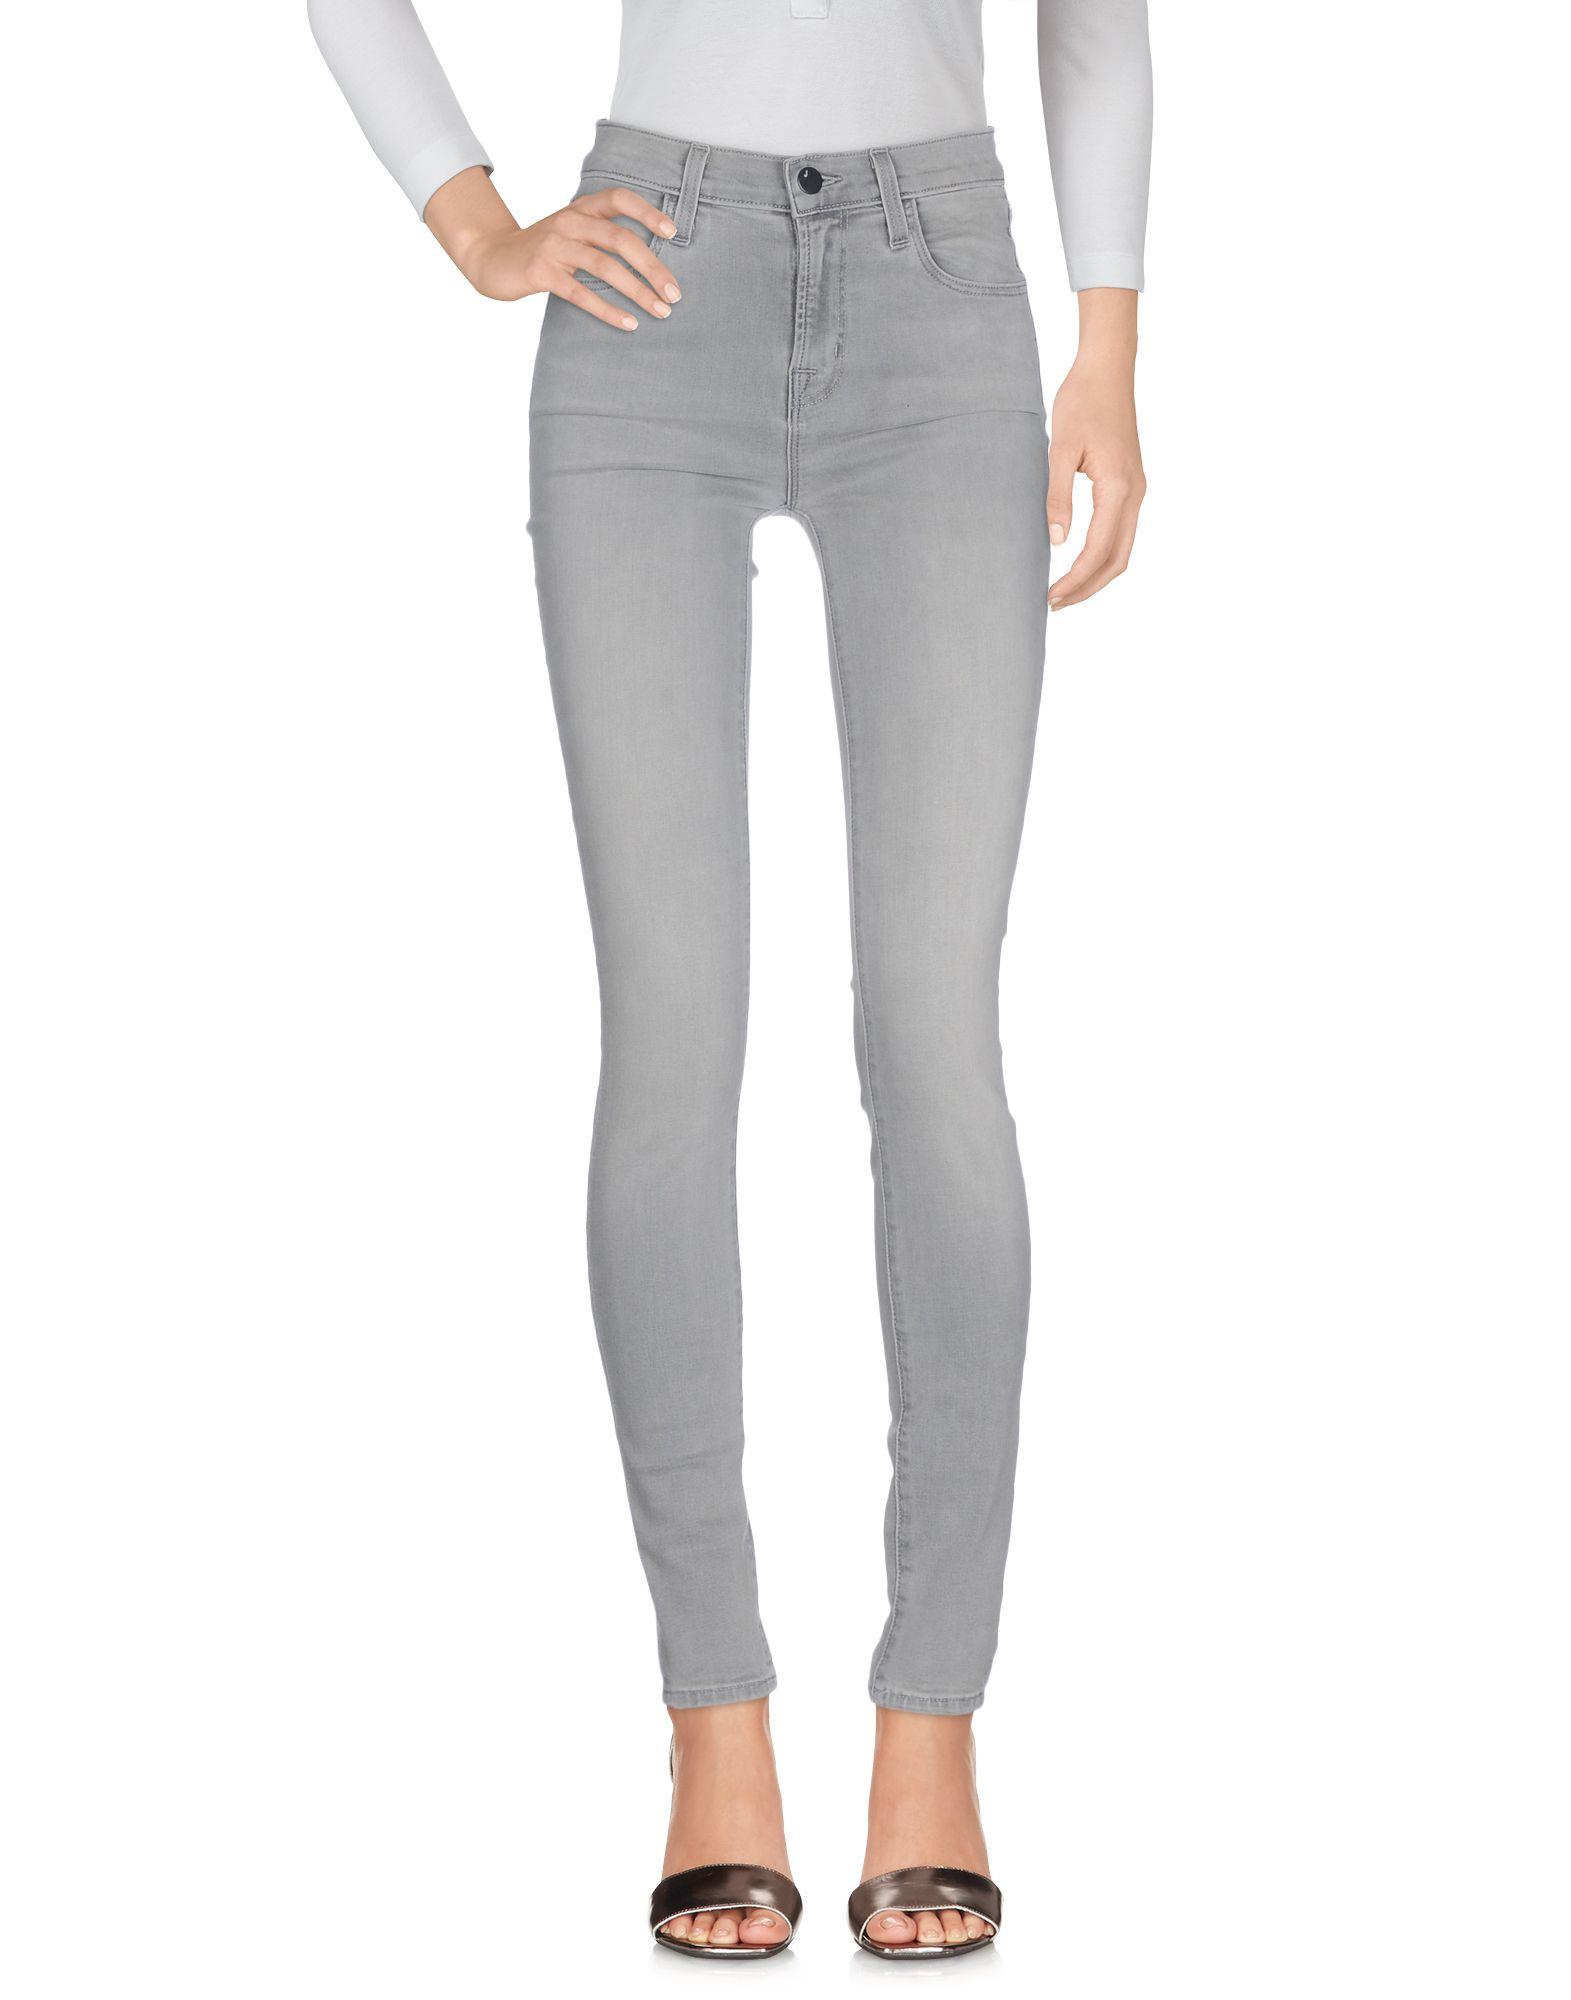 Pantaloni Jeans J Brand Donna - Acquista online su IJR9lyYR